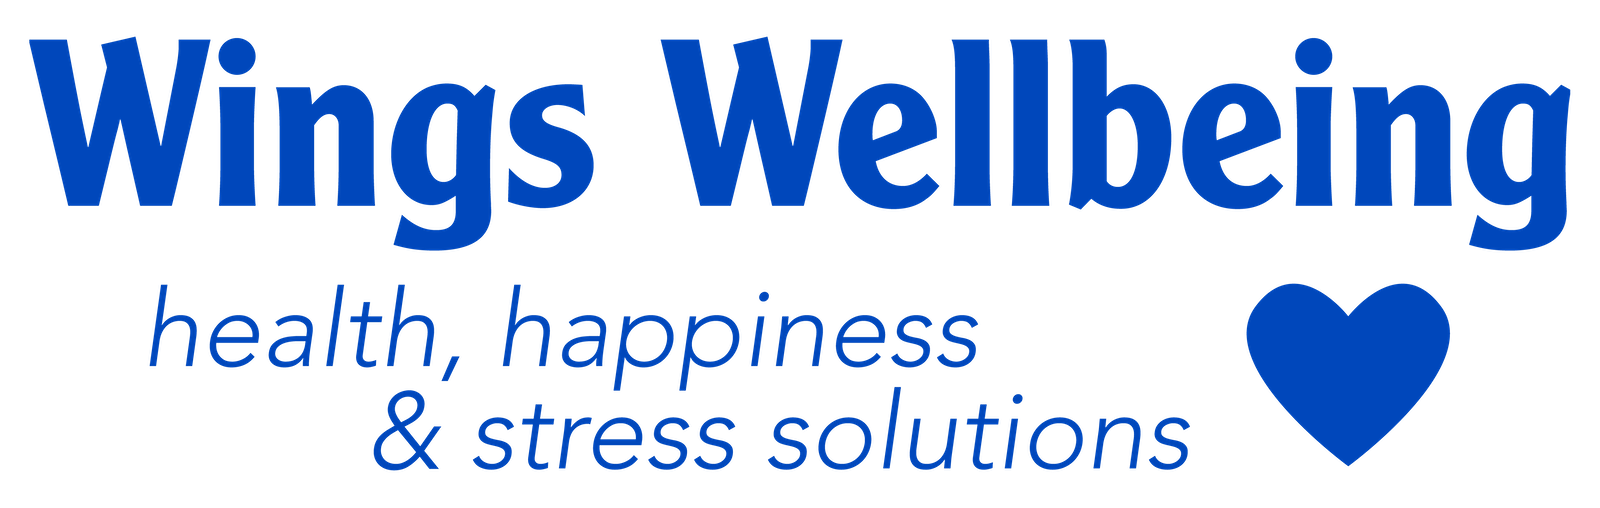 Wings Wellbeing Logo